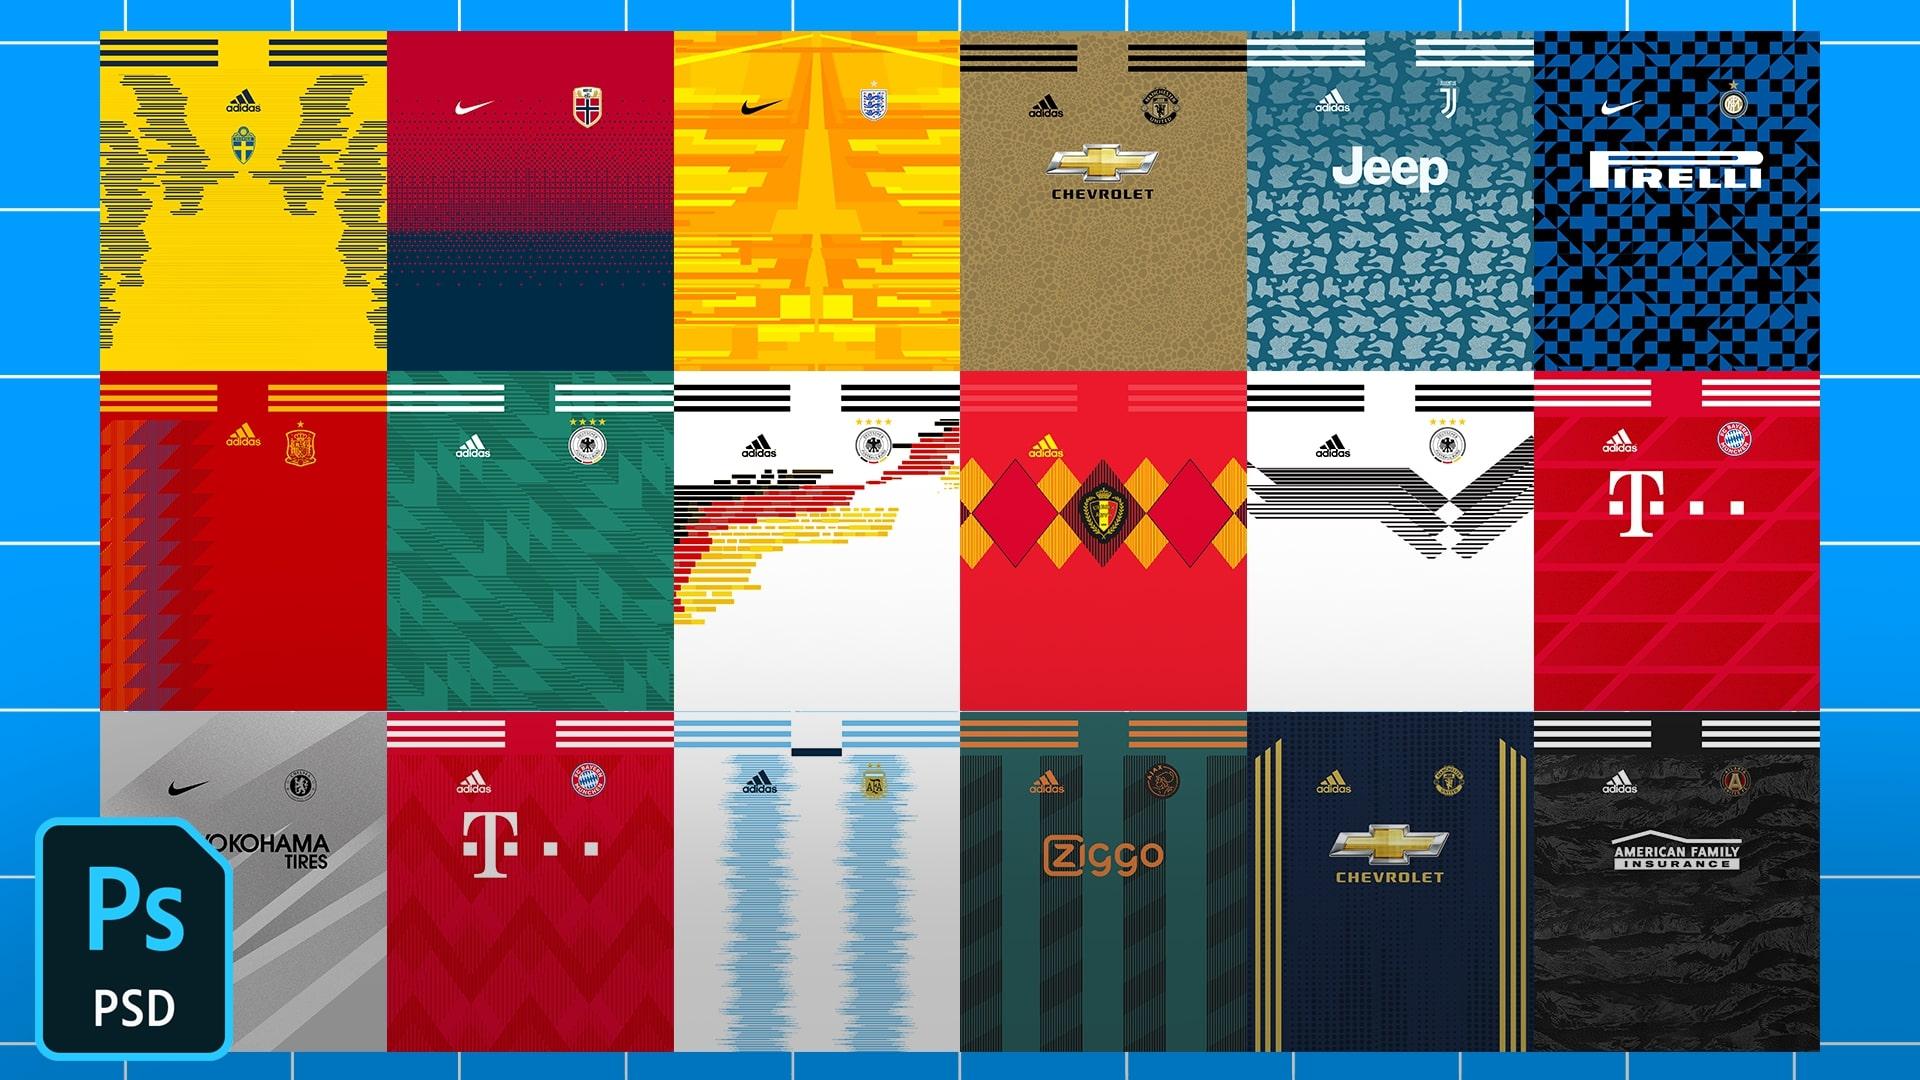 Football/Soccer Jersey Patterns Pack